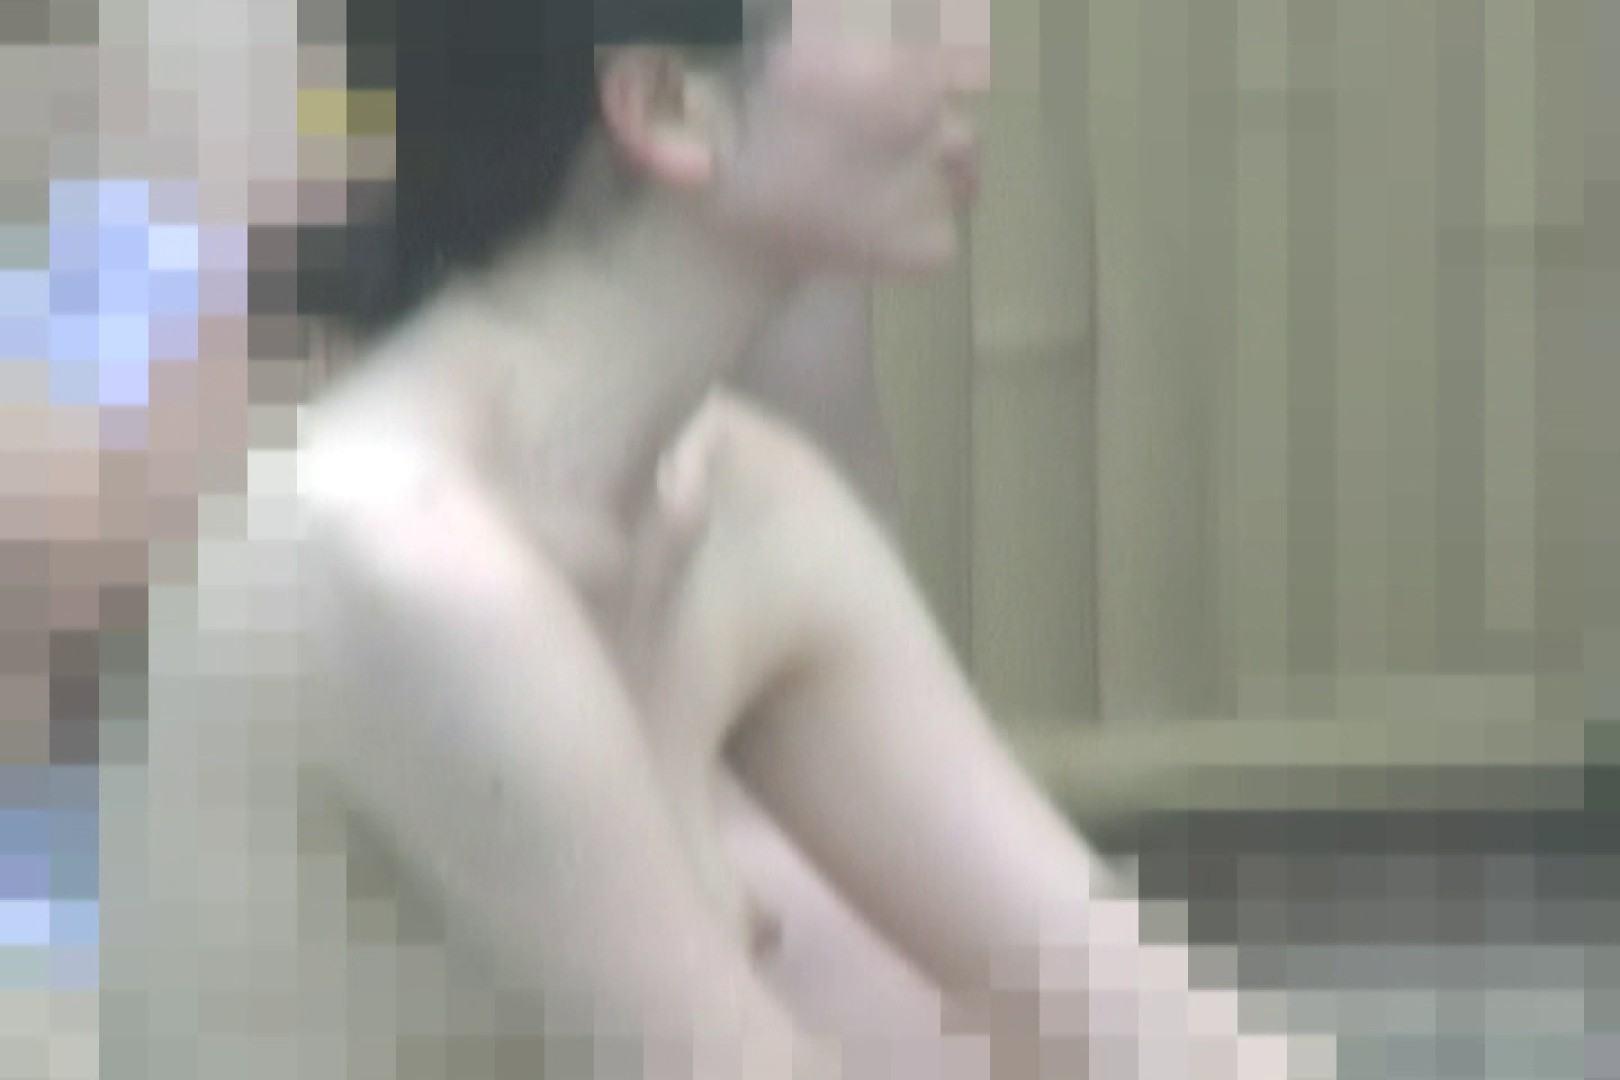 Aquaな露天風呂Vol.835 盗撮シリーズ   露天風呂編  92PIX 61